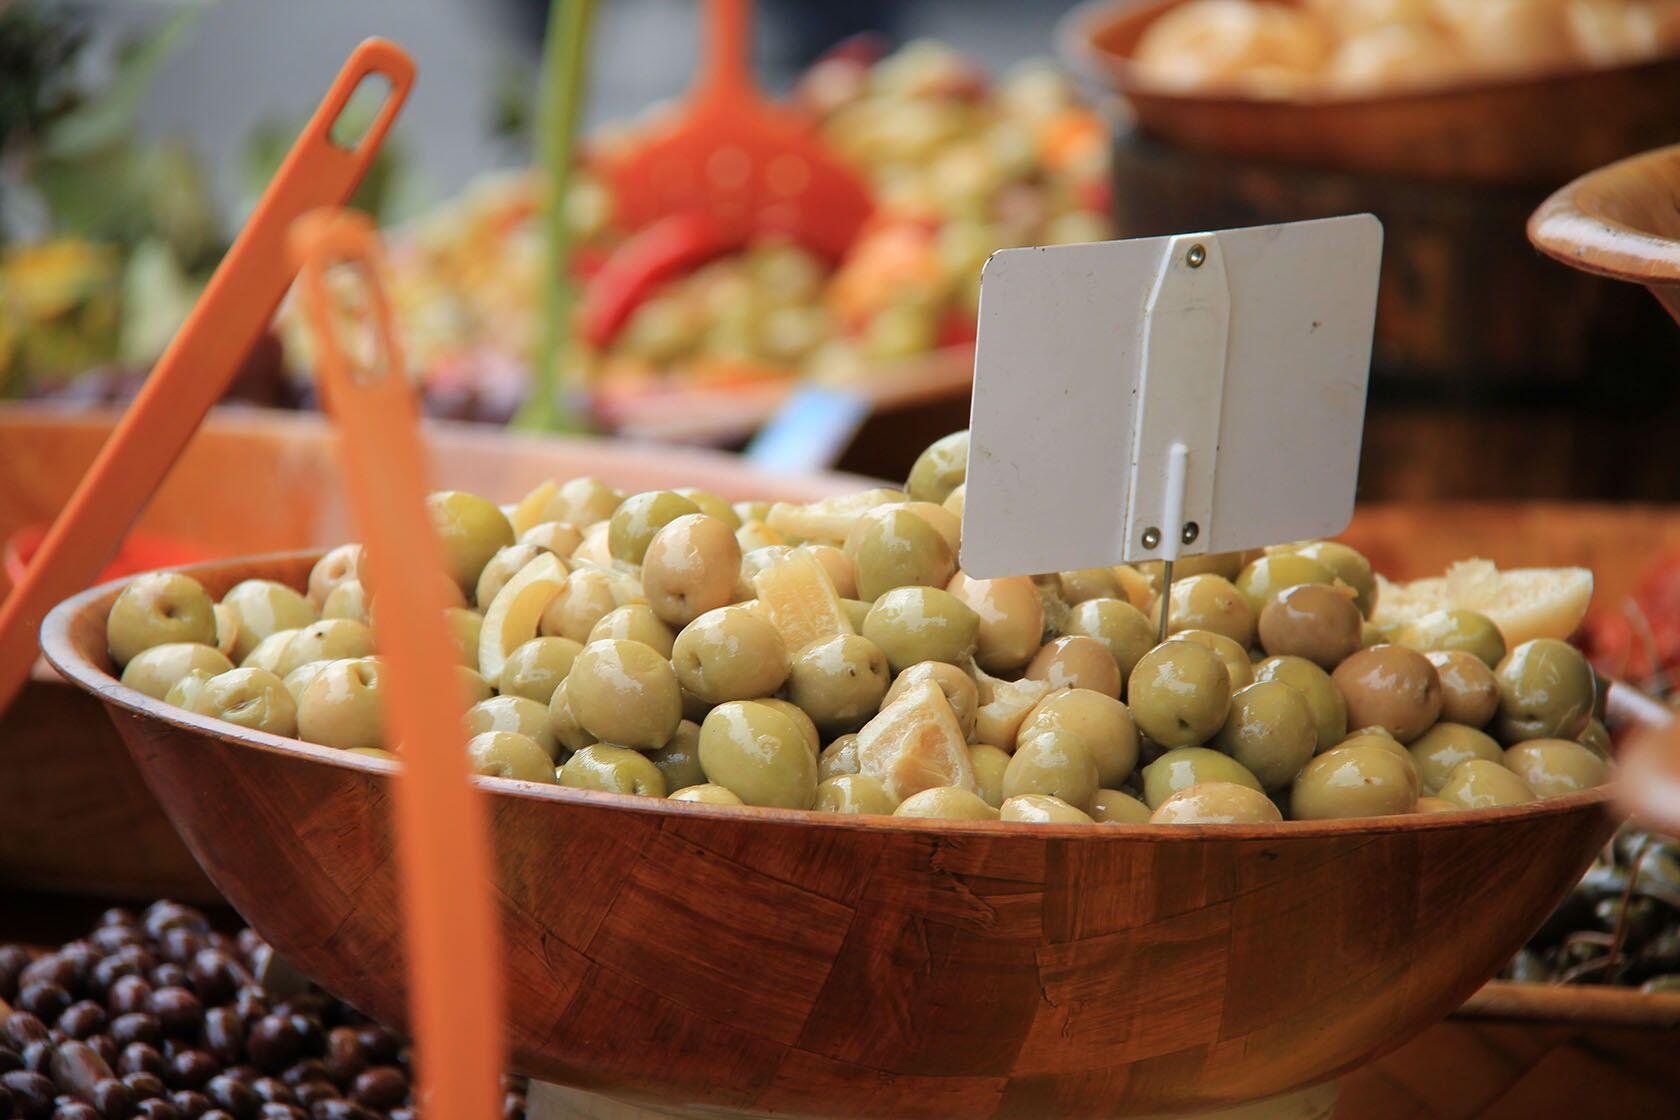 Markets Provence Cote d'Azur olives